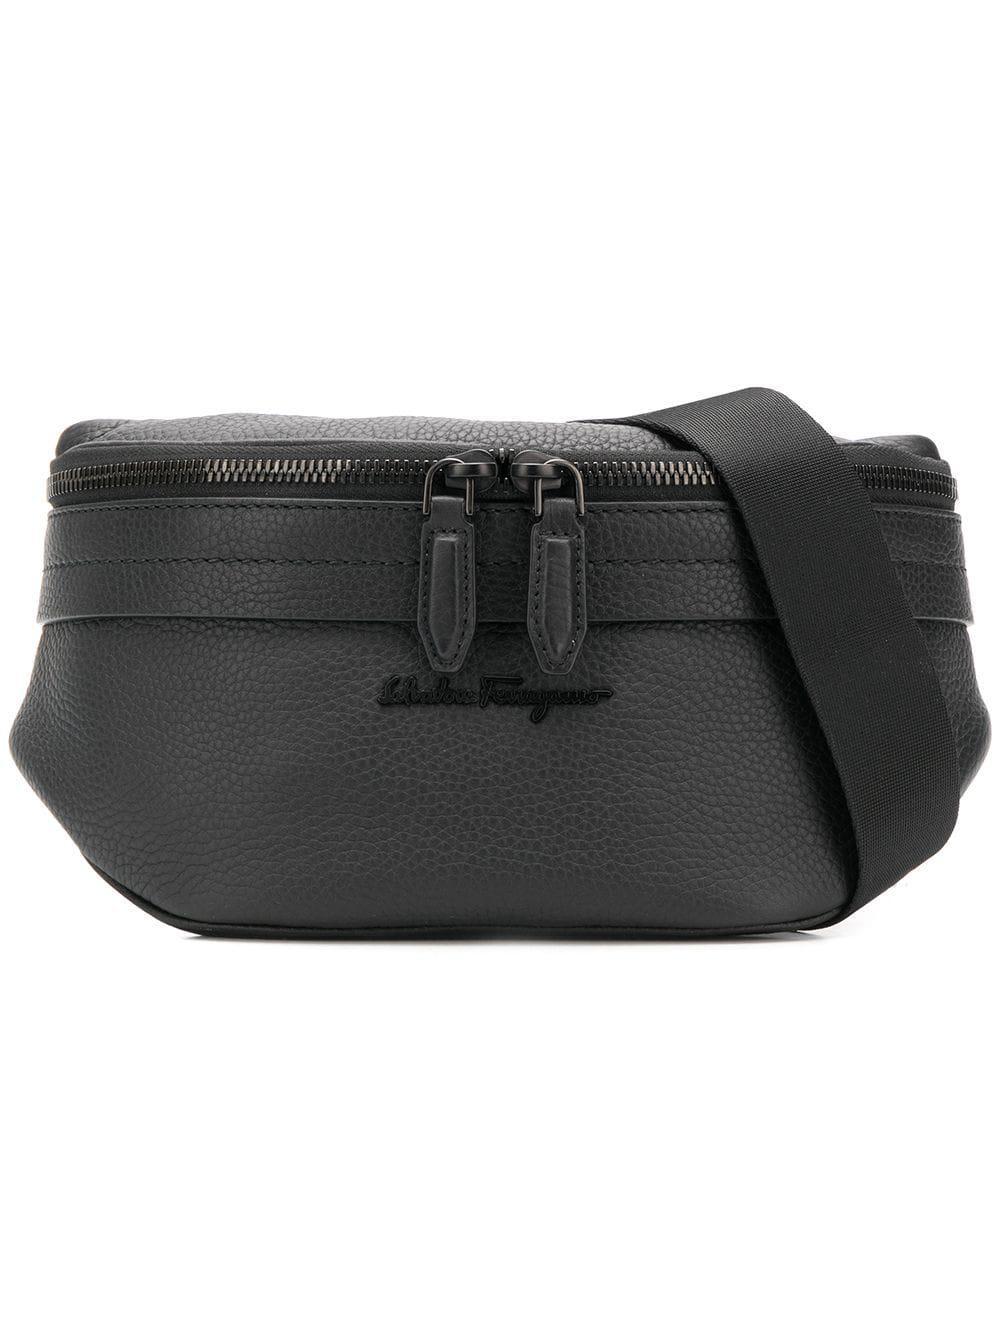 87827c8fdee Ferragamo - Black Leather Pouch for Men - Lyst. View fullscreen